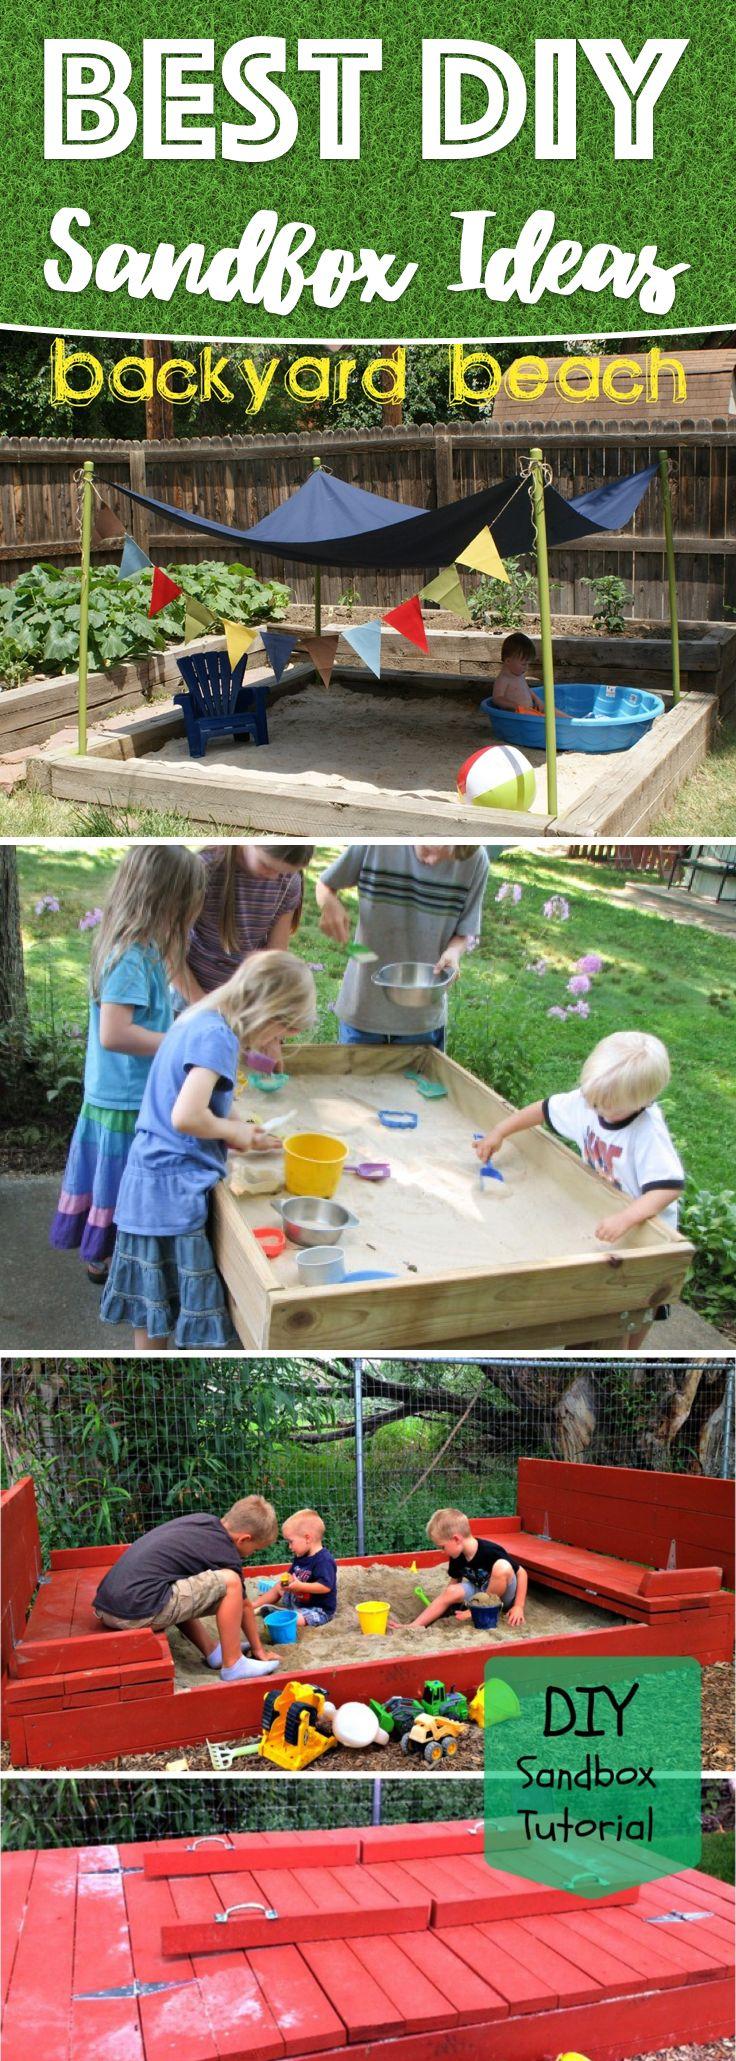 Backyard Sandbox Ideas diy sandbox with cover tutorial 25 Best Sandbox Ideas On Pinterest Sandbox Sandpit Ideas And Kids Sandbox